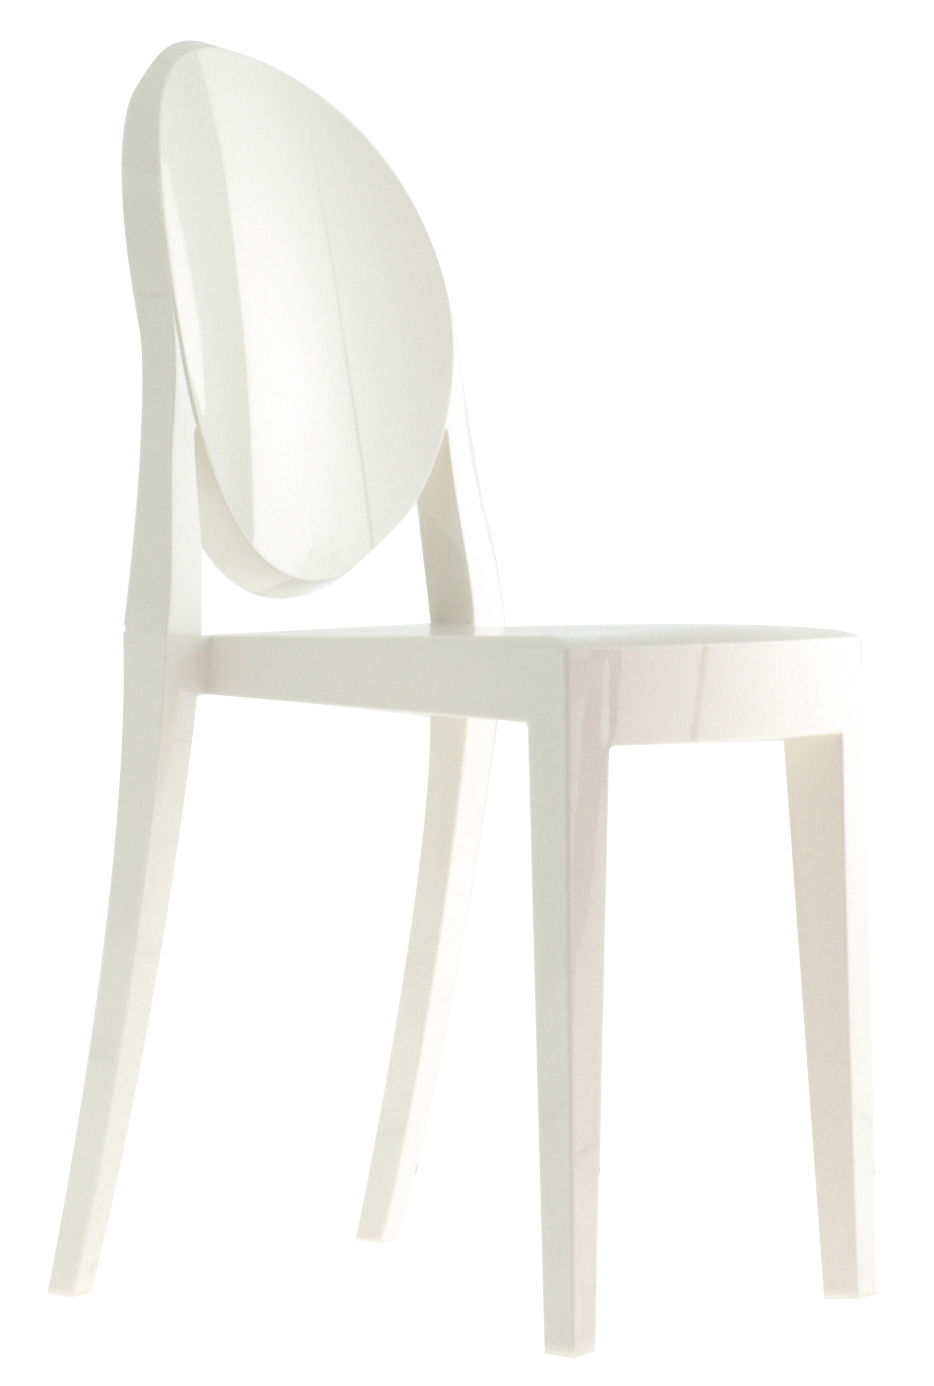 victoria ghost opak ausf hrung kartell stuhl. Black Bedroom Furniture Sets. Home Design Ideas